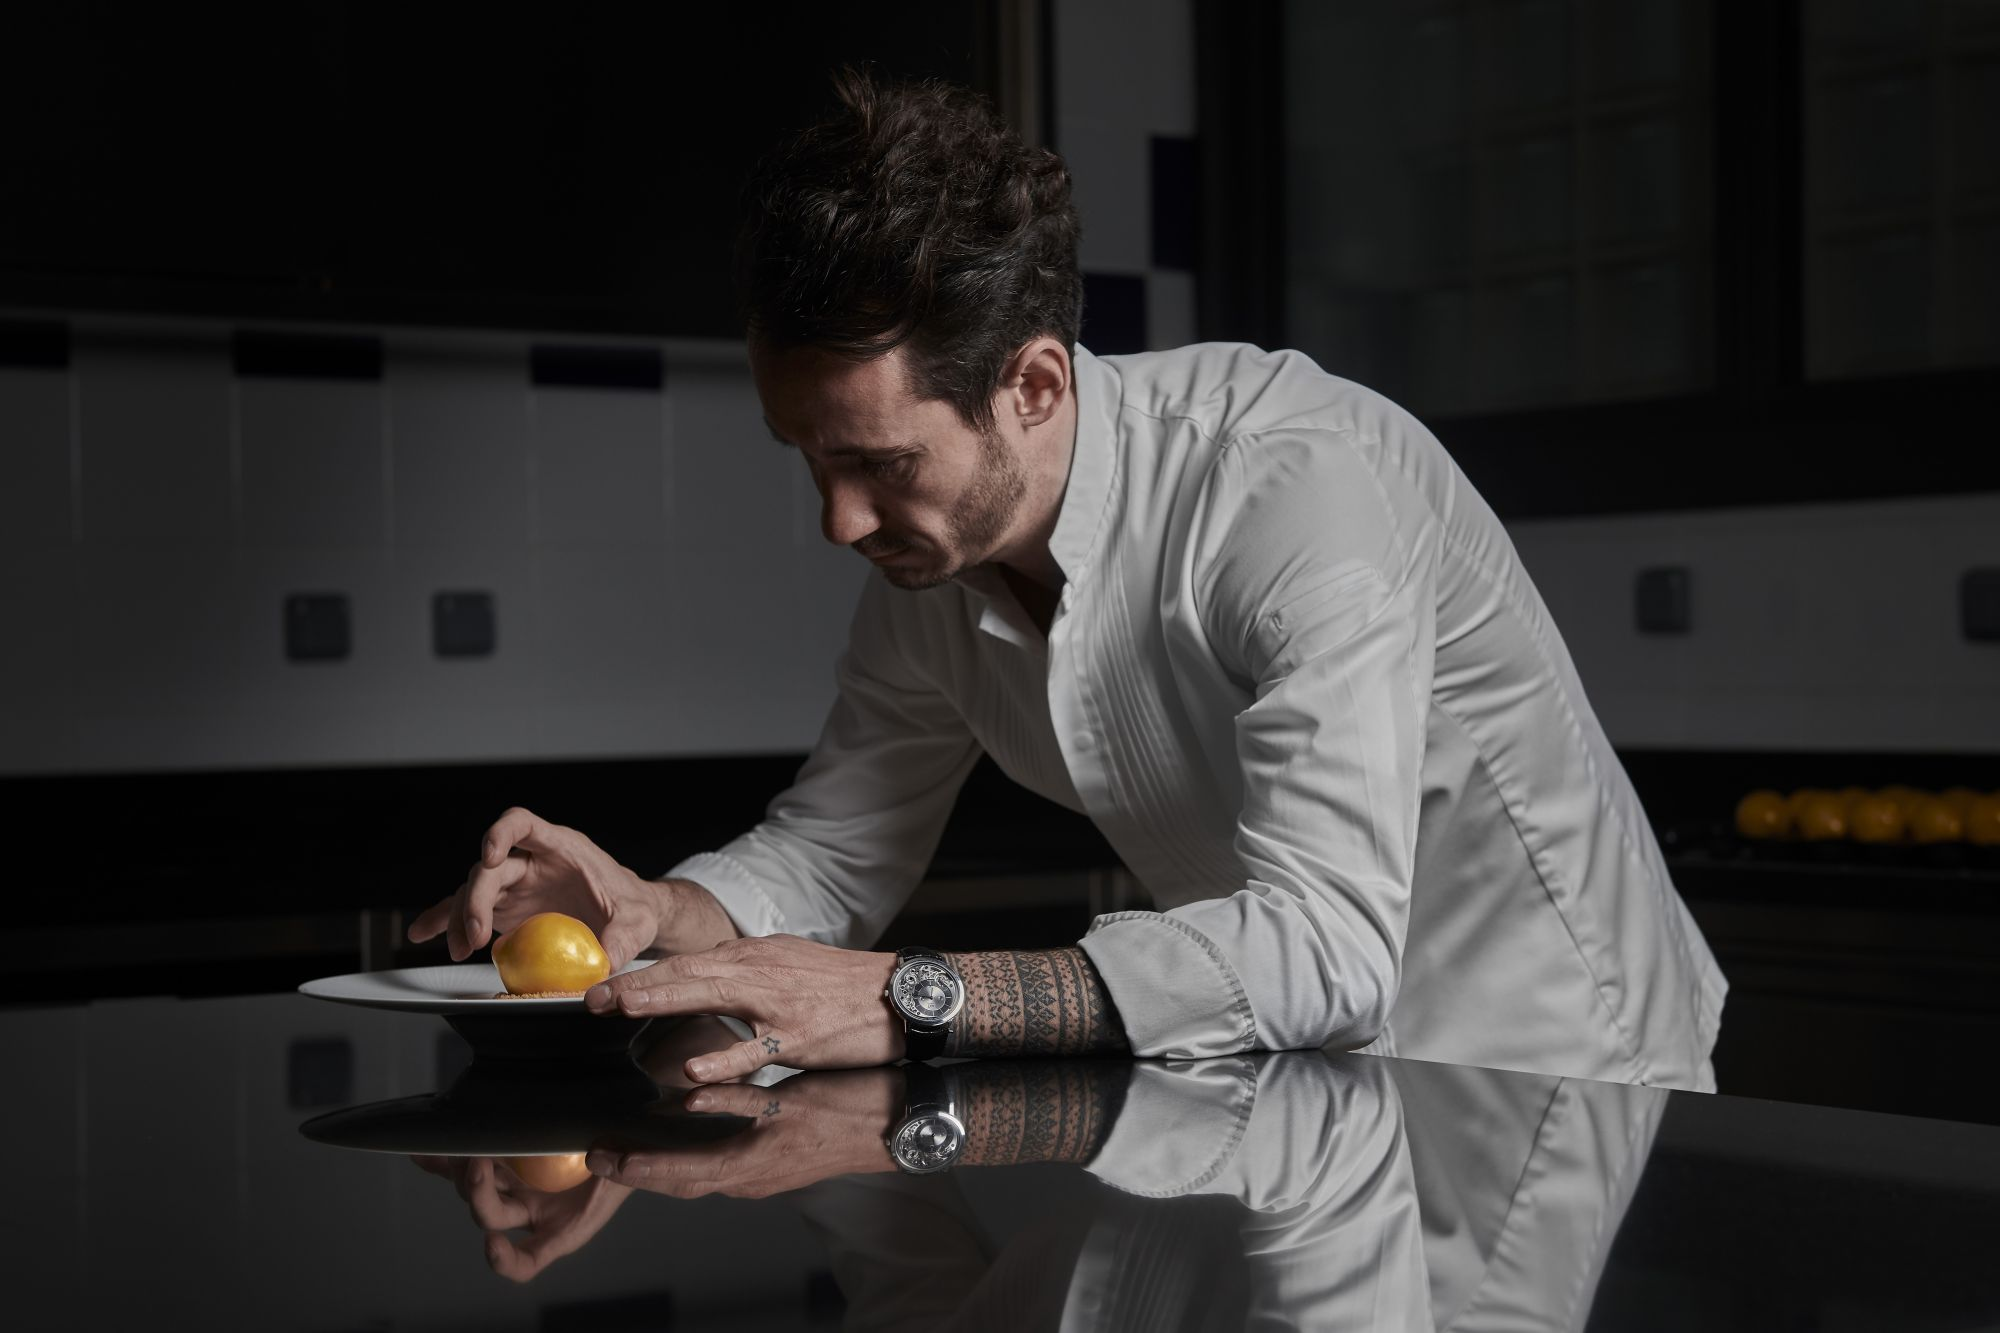 Piaget品牌大使暨甜點藝術家Cédric Grolet,用甜點藝術征服味蕾與時間!